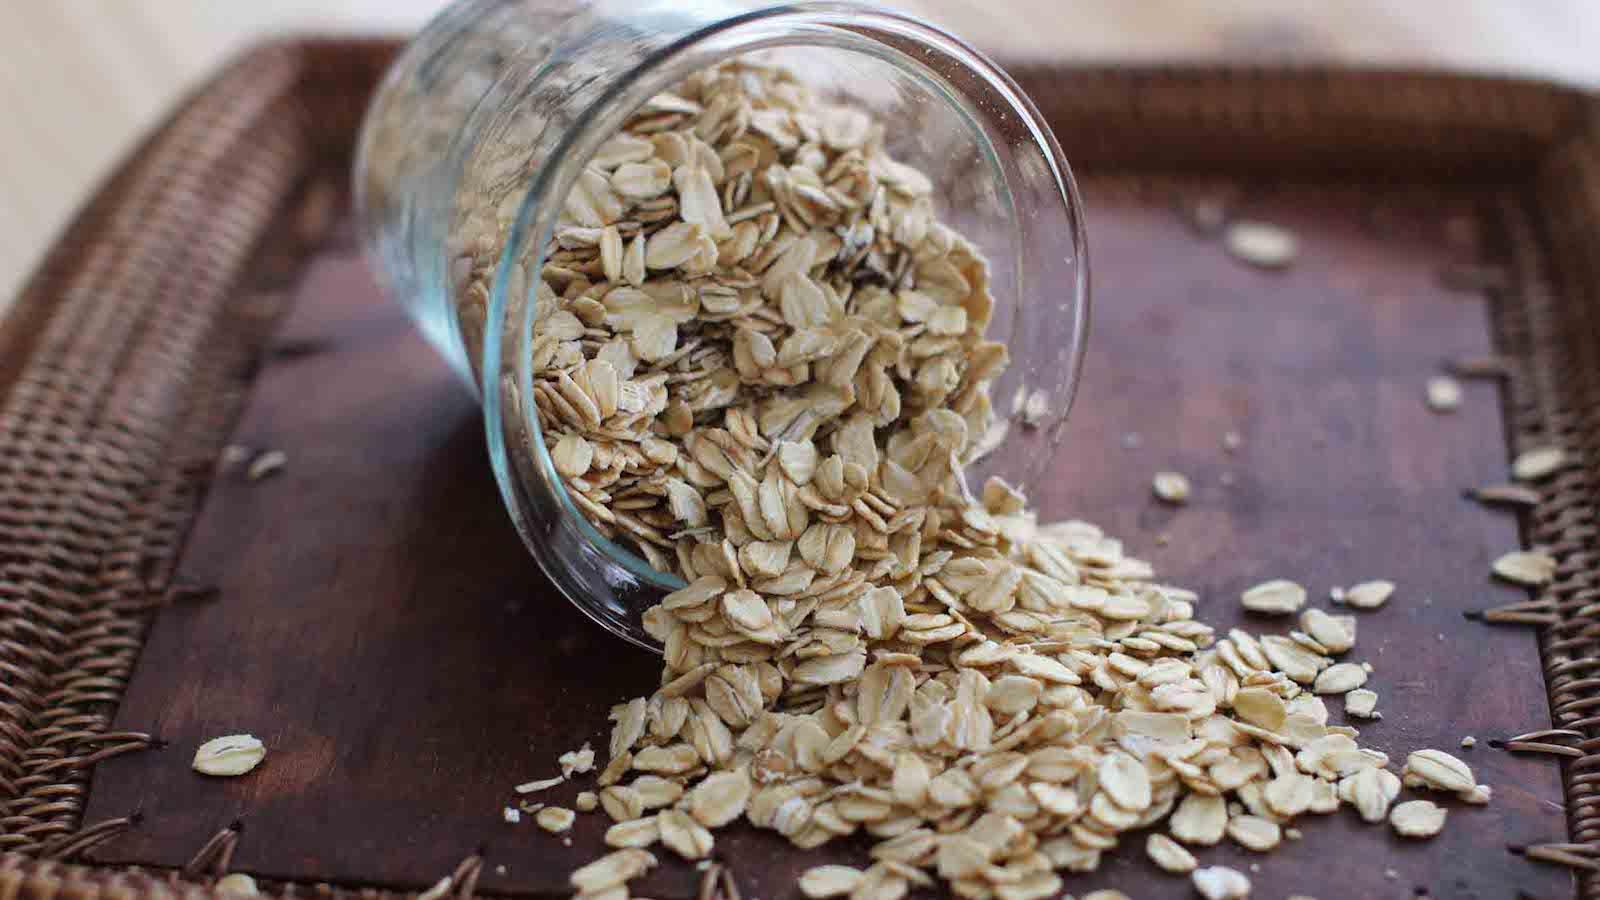 The gluten-free craze is making celiacs like me sick — Quartz